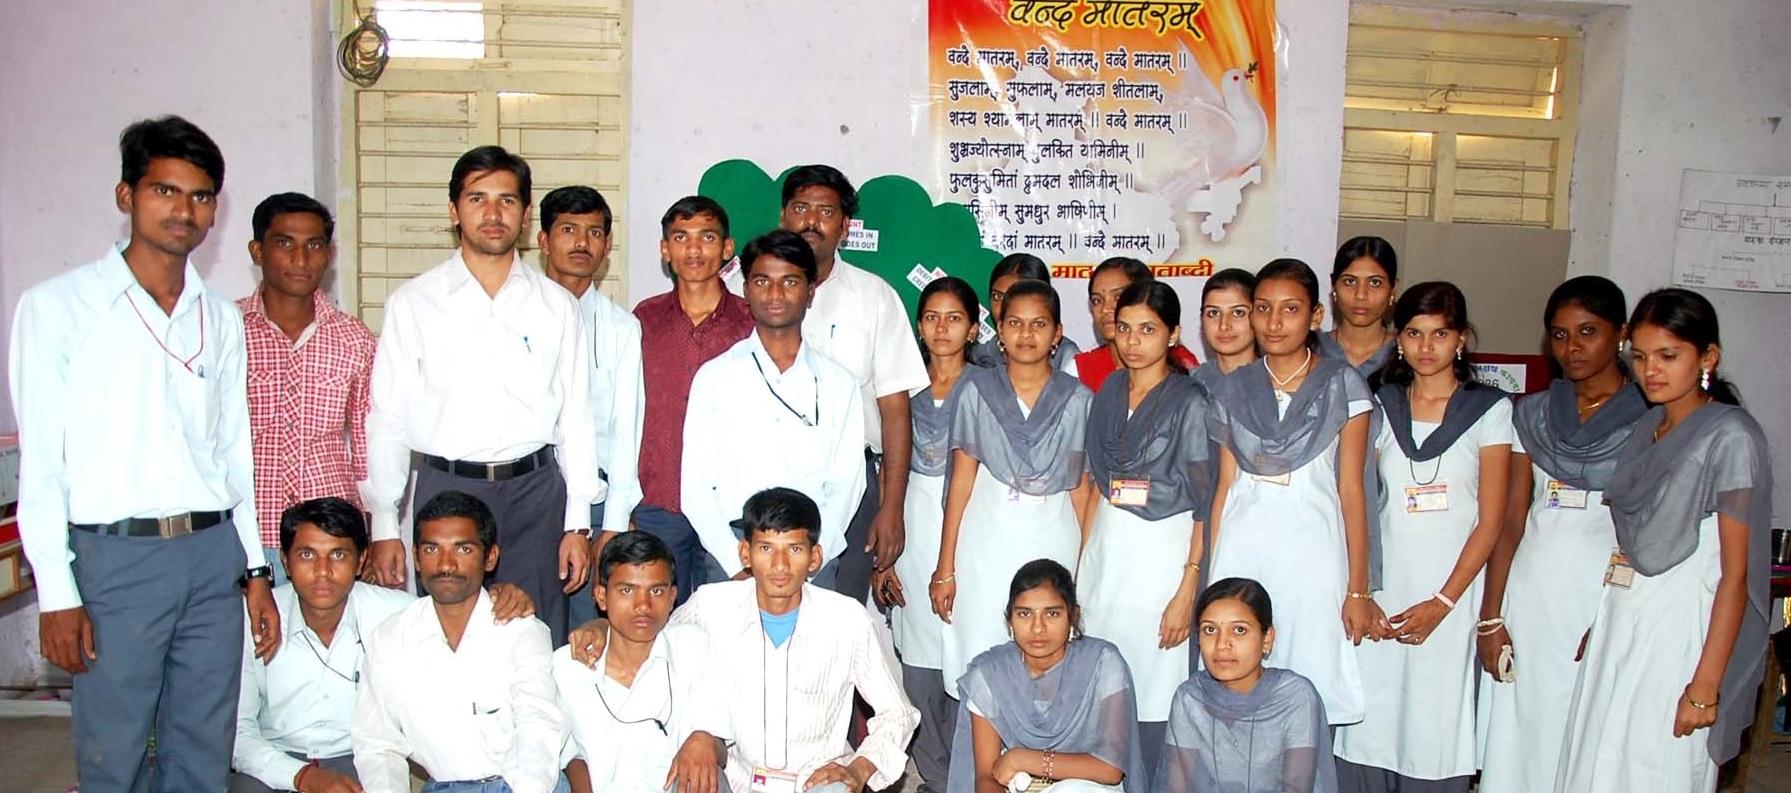 Master Deenanath Mangeshkar College, Latur